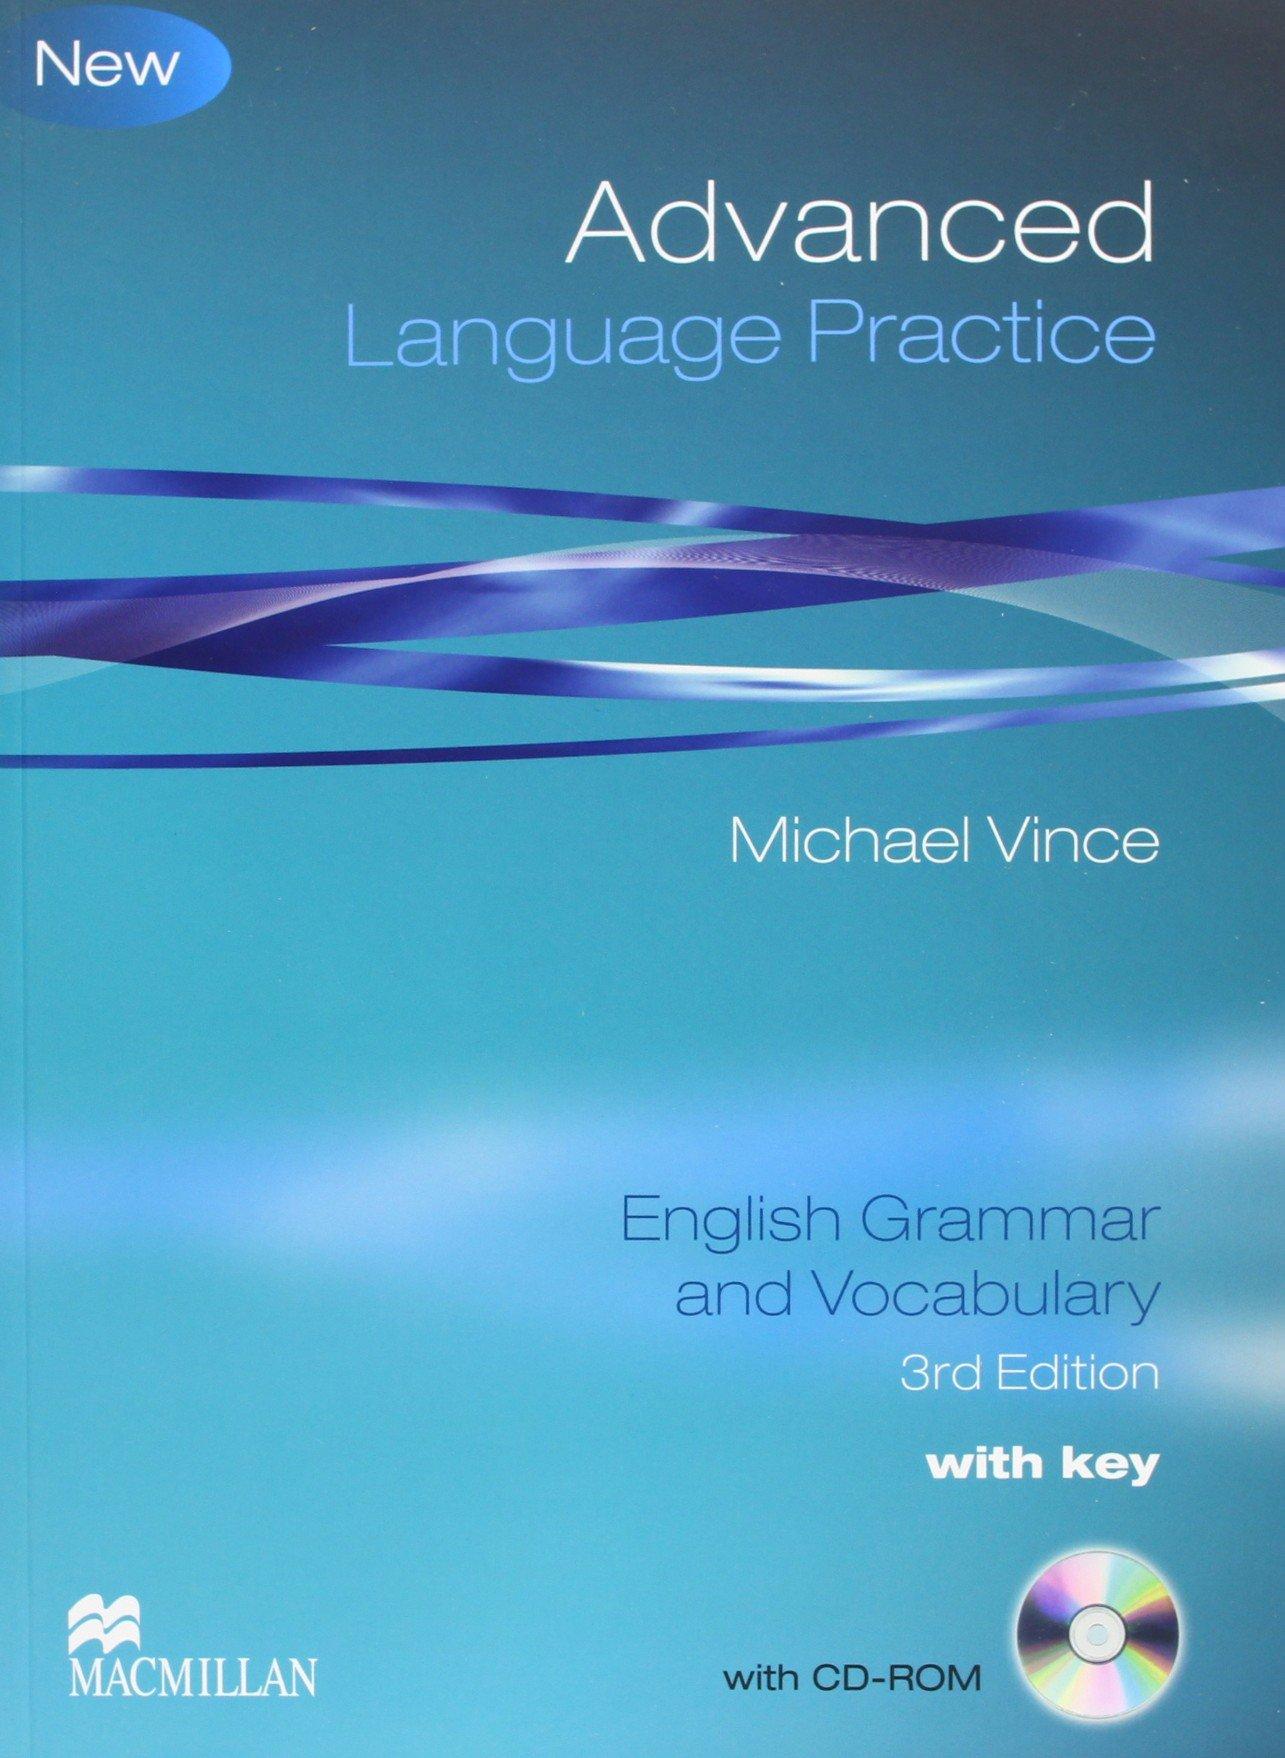 Advanced Language Practice. Student's Book with Key: Amazon.co.uk: Michael  Vince: 9783190228881: Books